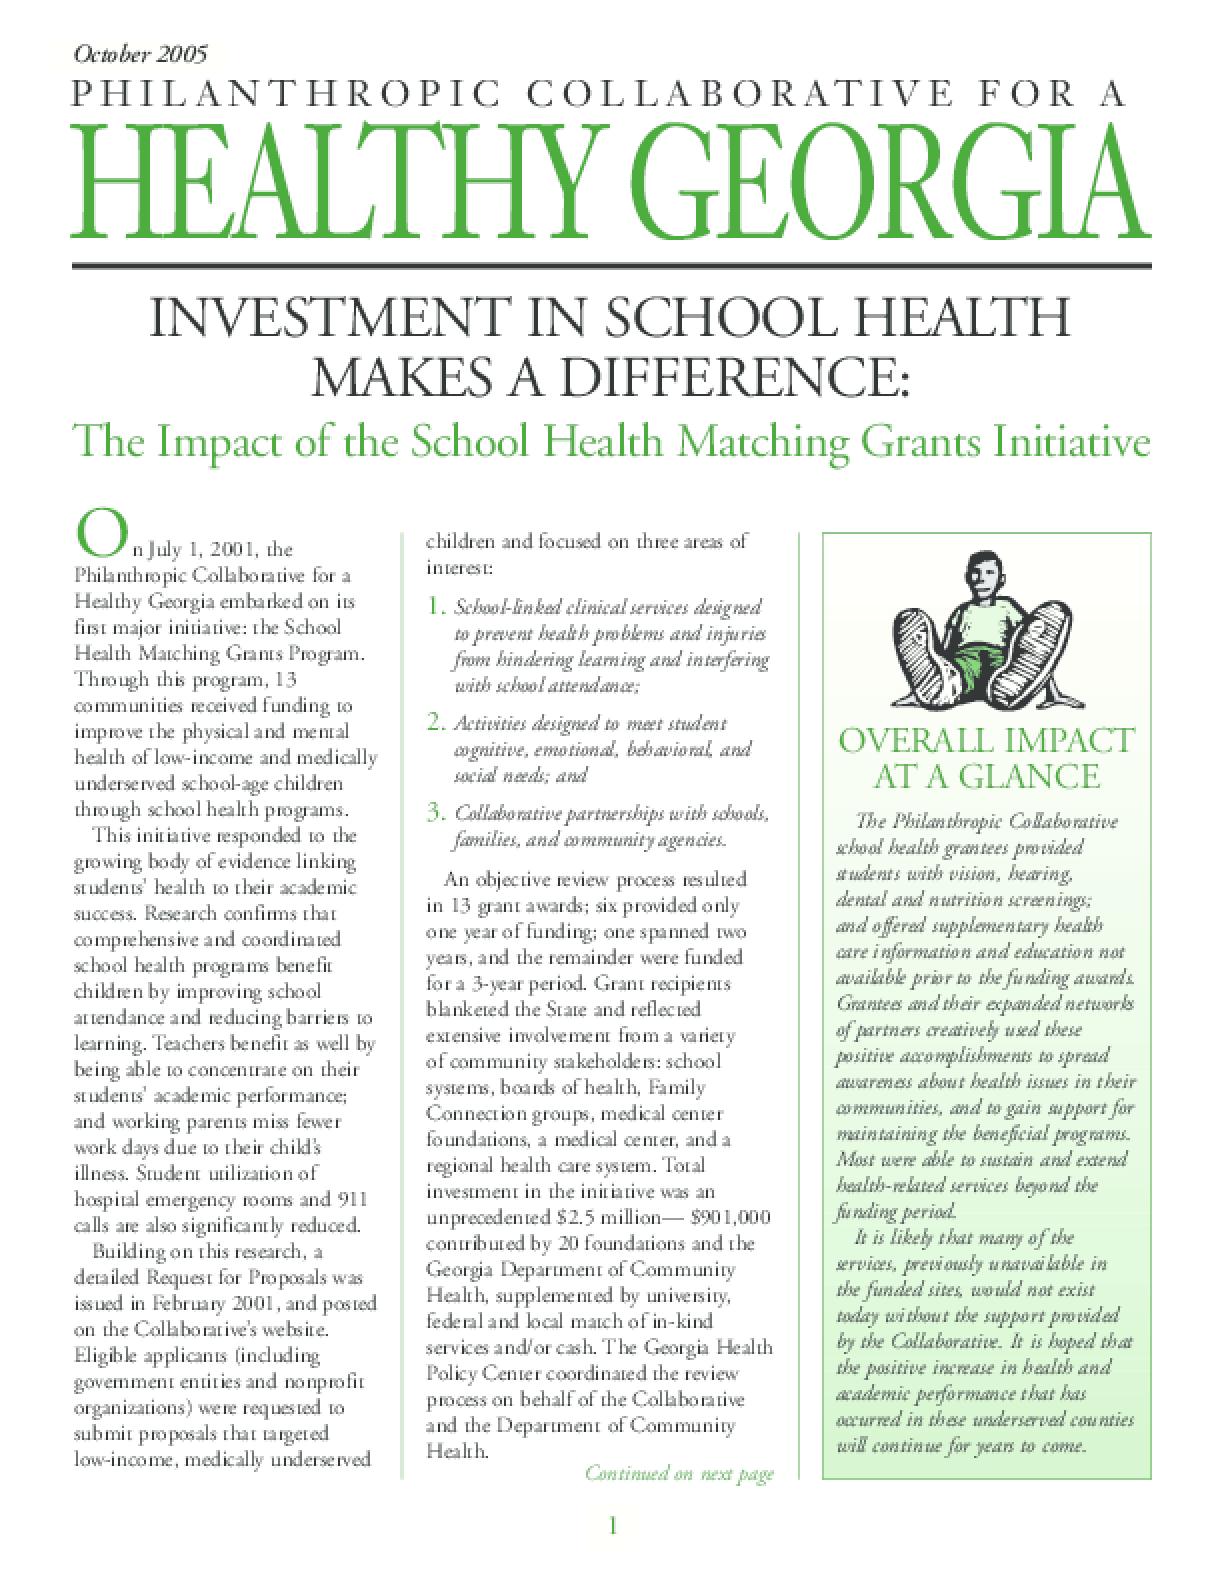 School Health Initiative Evaluation Outcomes